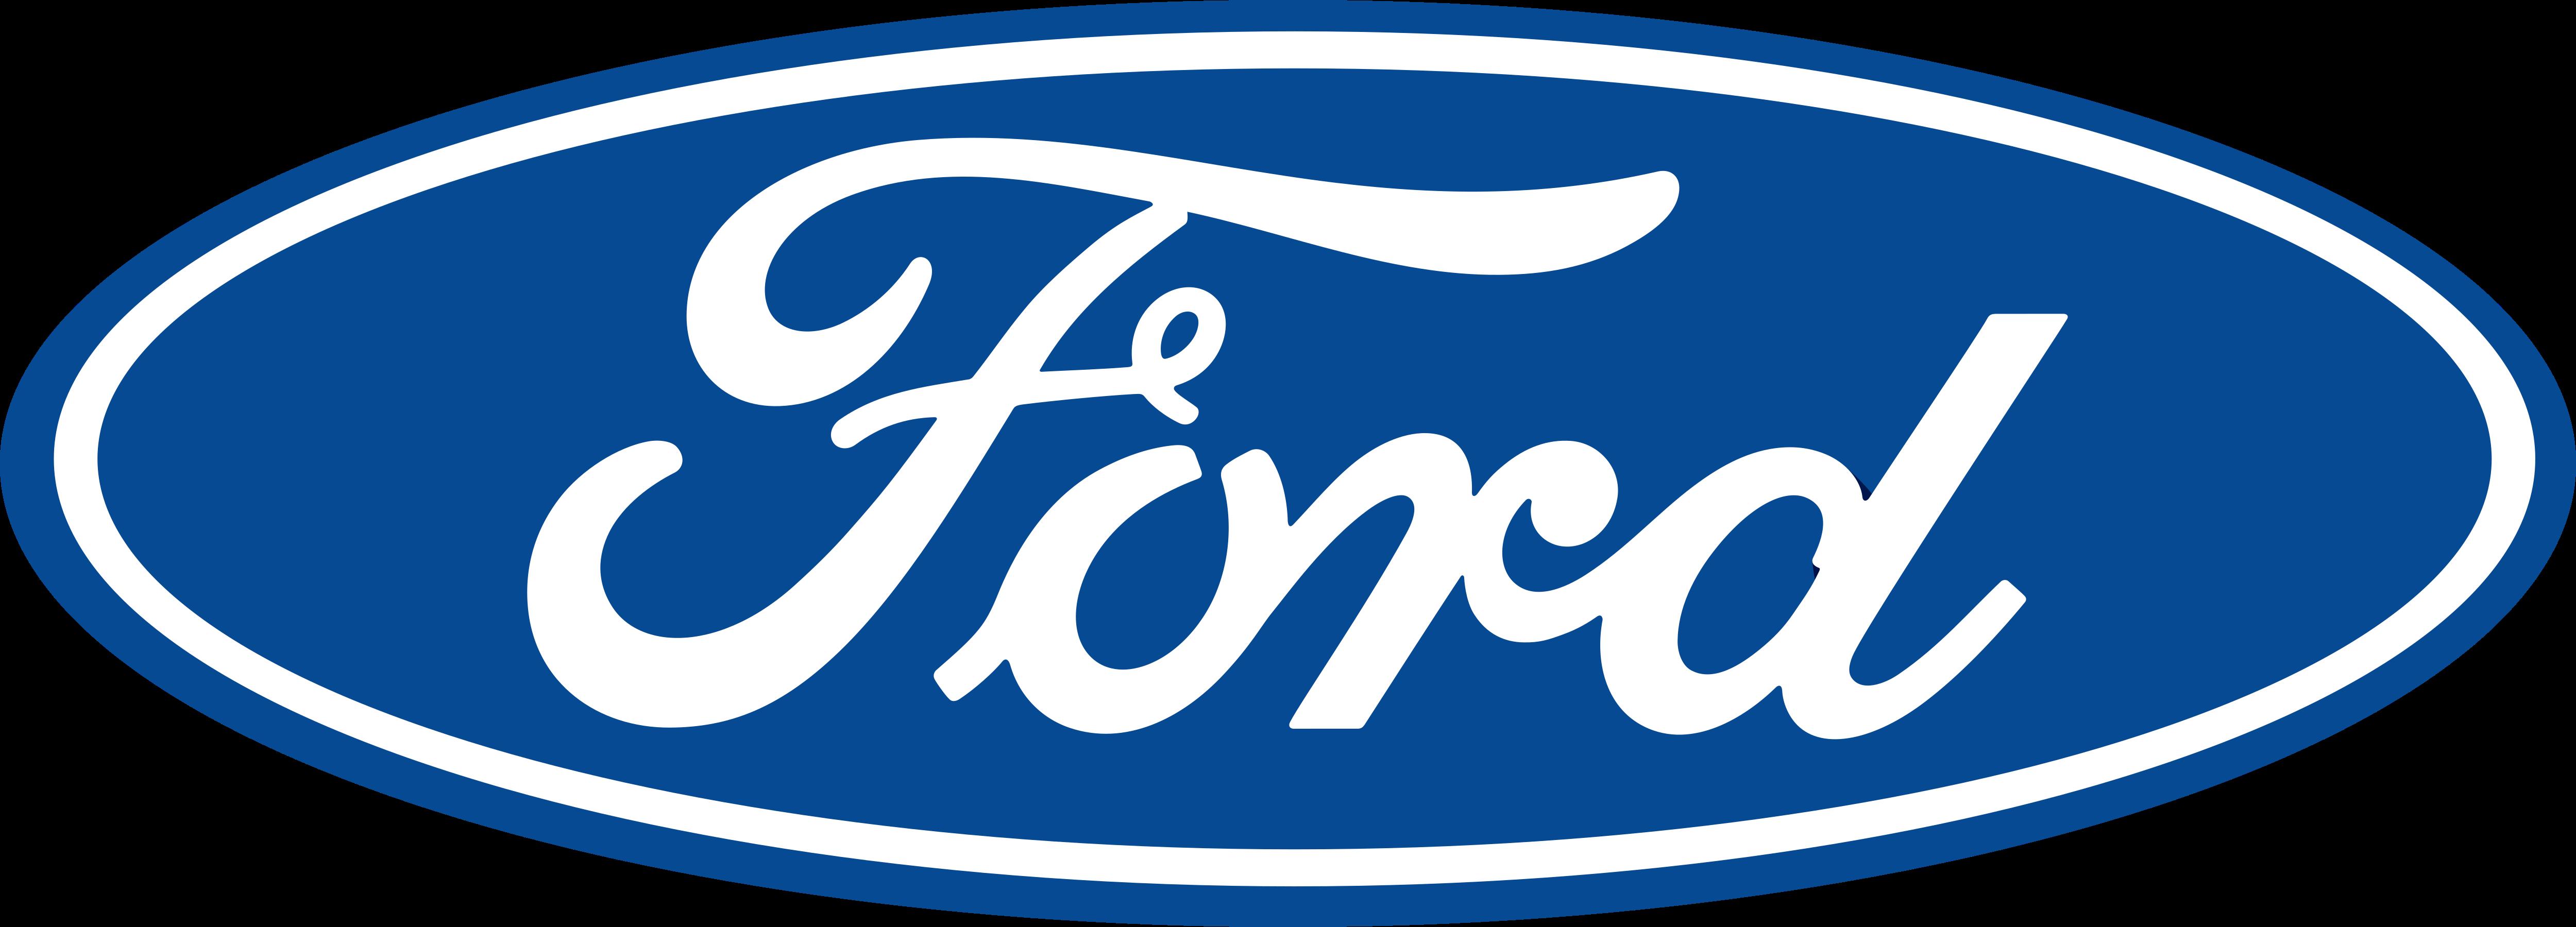 Ford logotyp